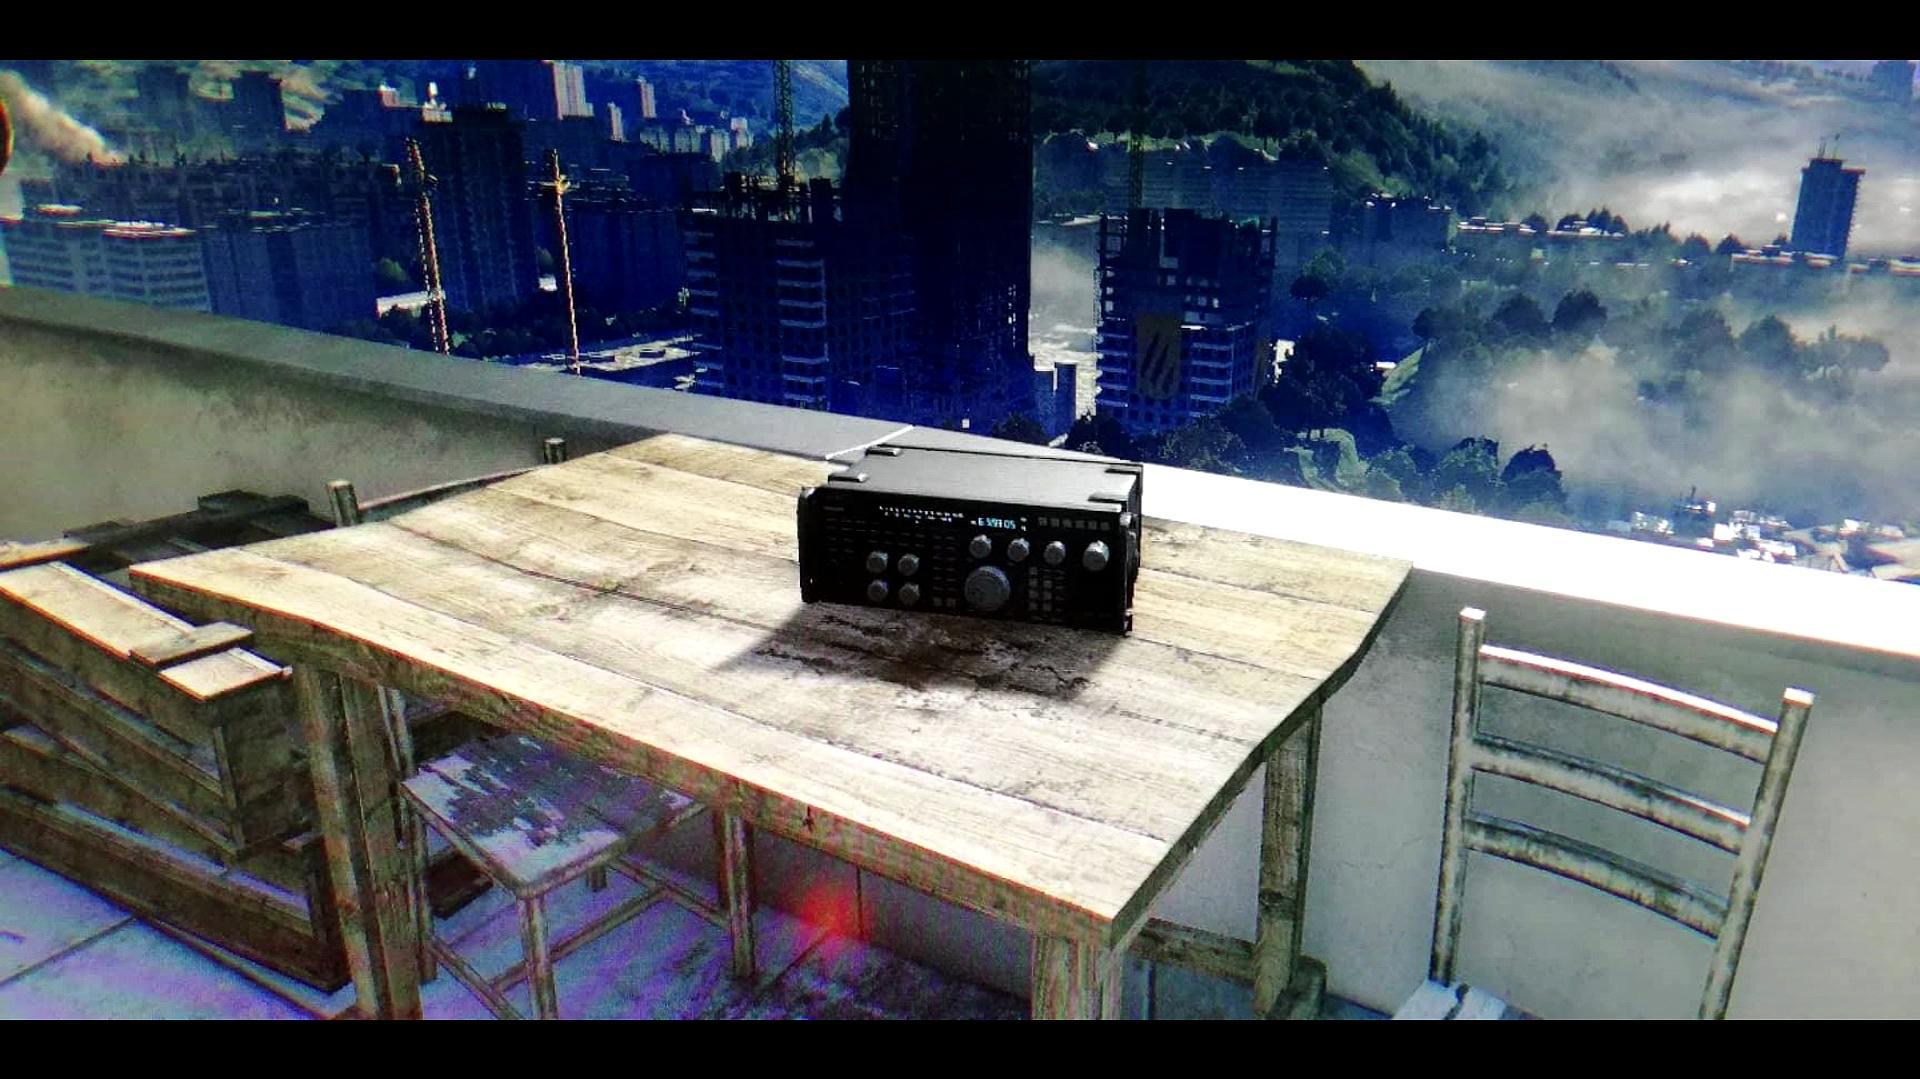 The Tower radio distress call